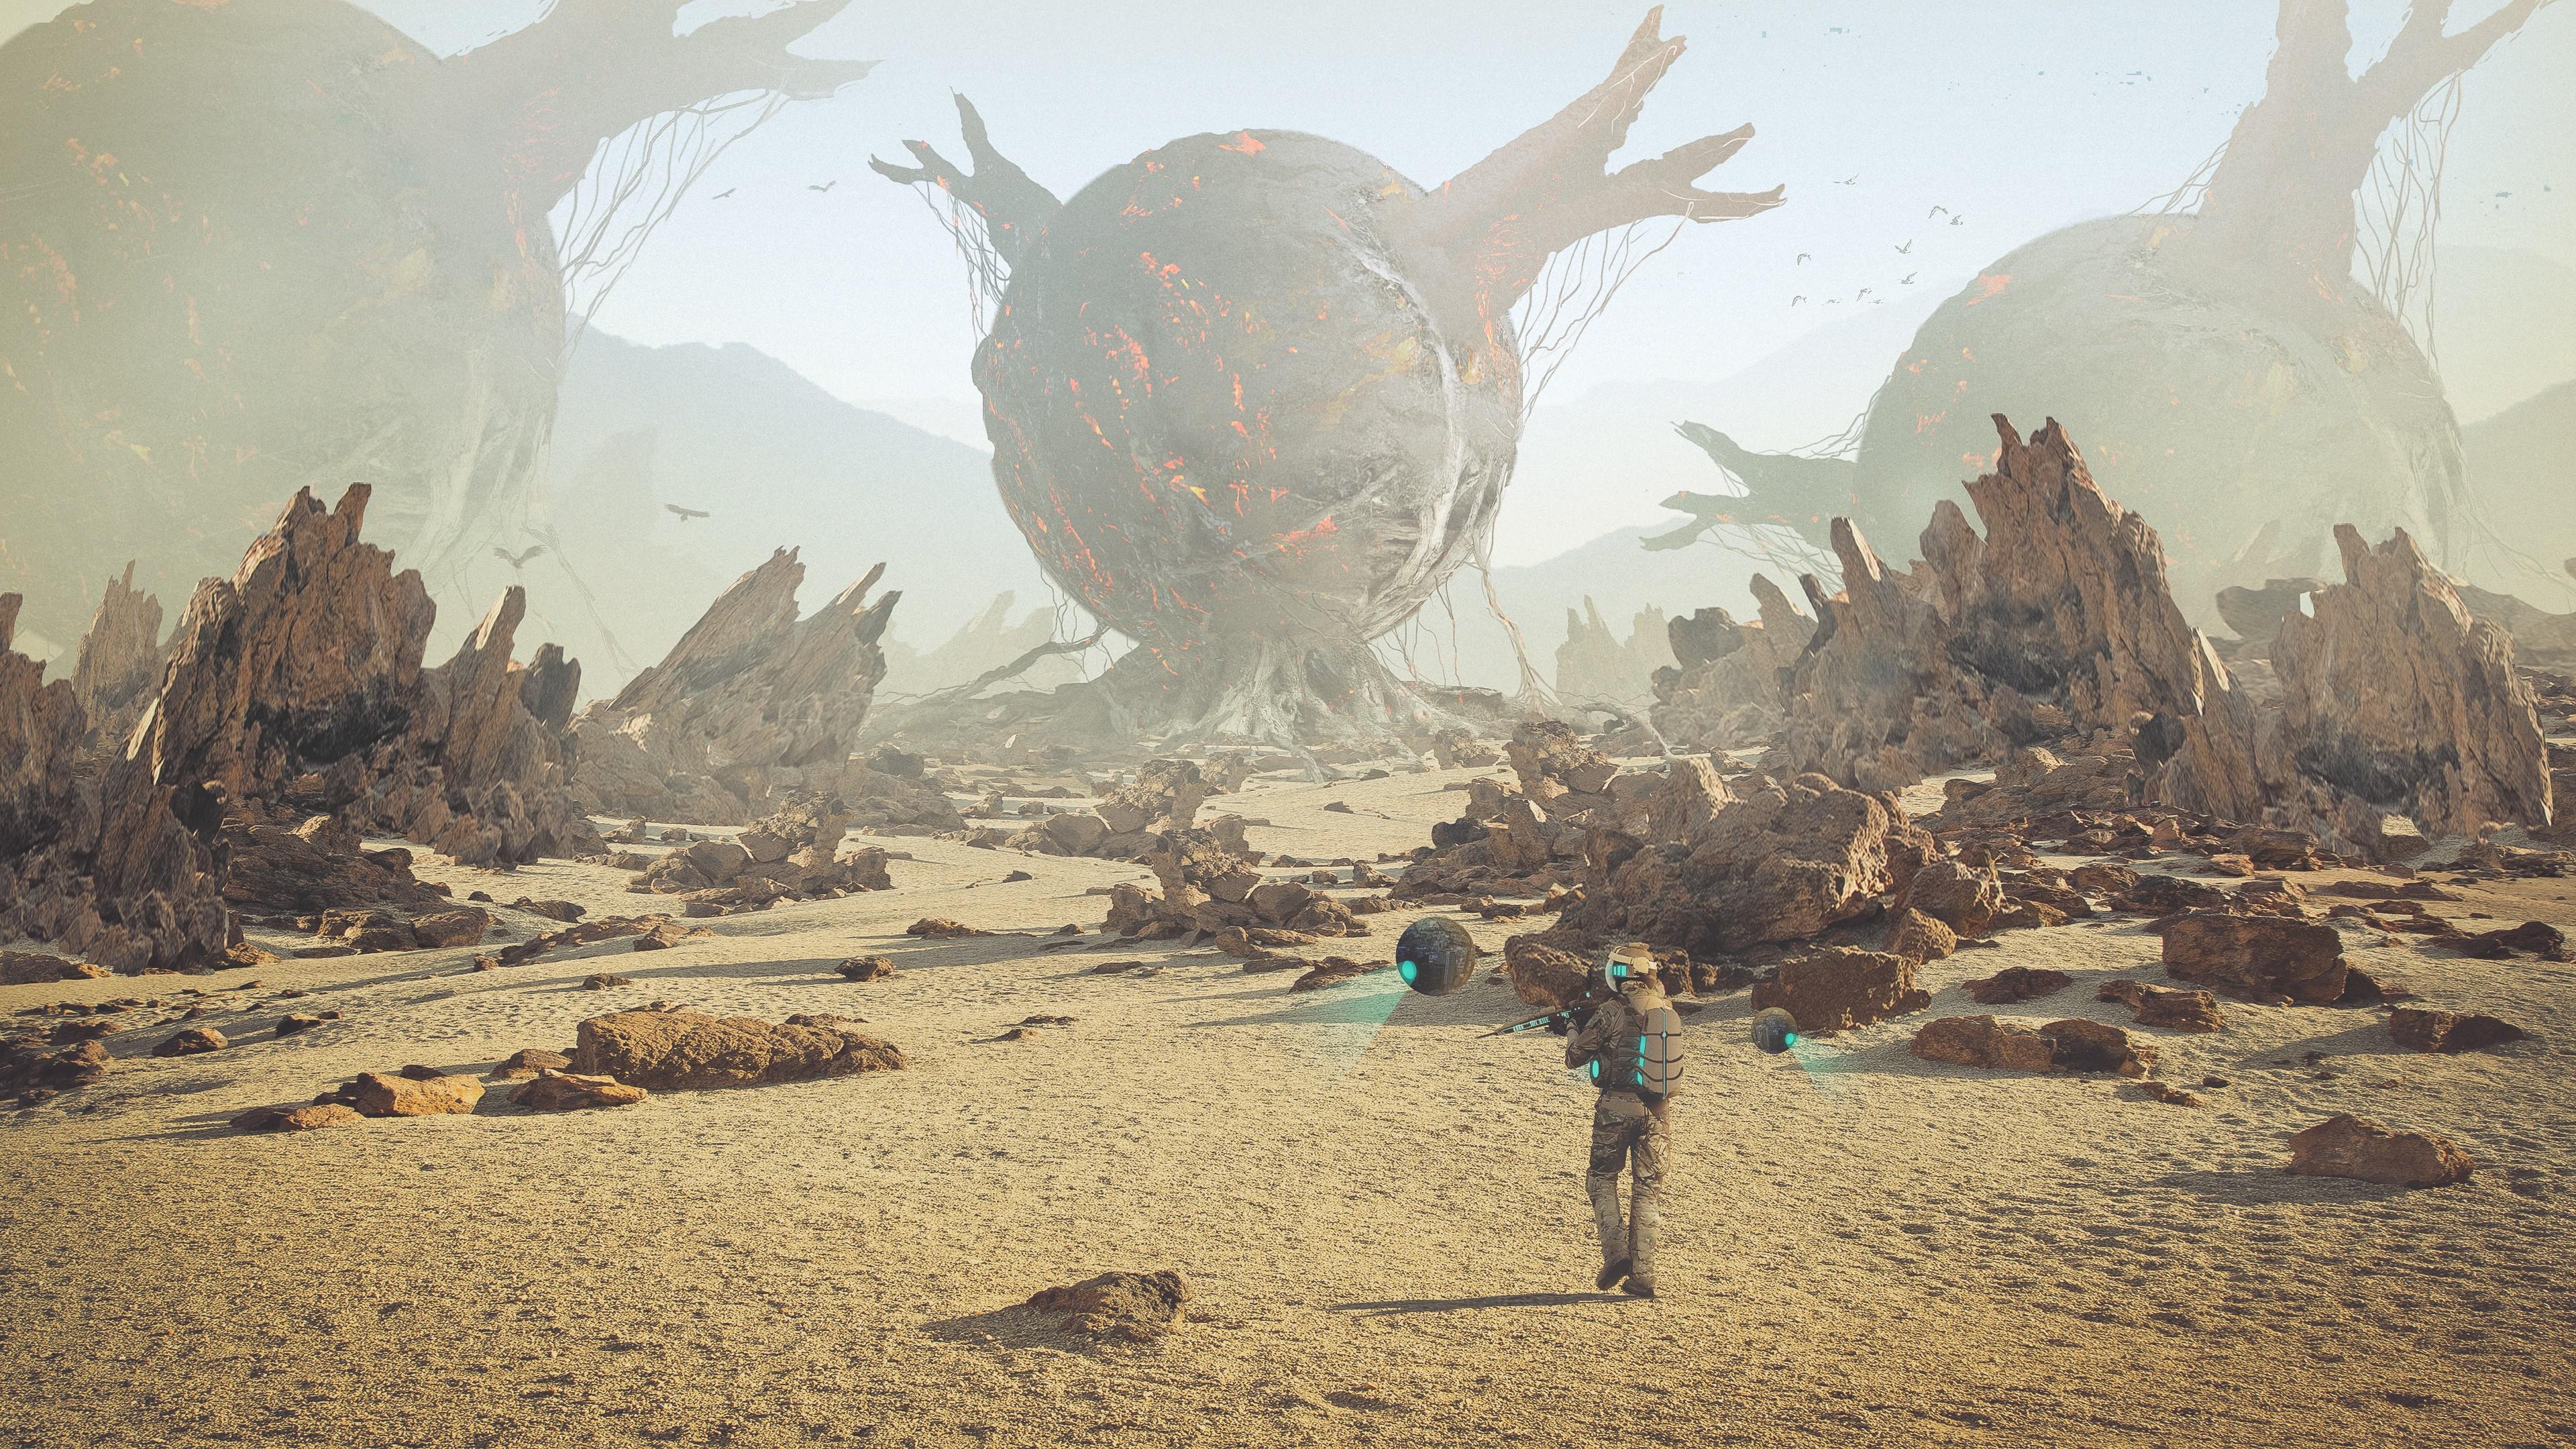 General 3840x2160 artwork spacesuit digital art robot futuristic desert rock looking into the distance